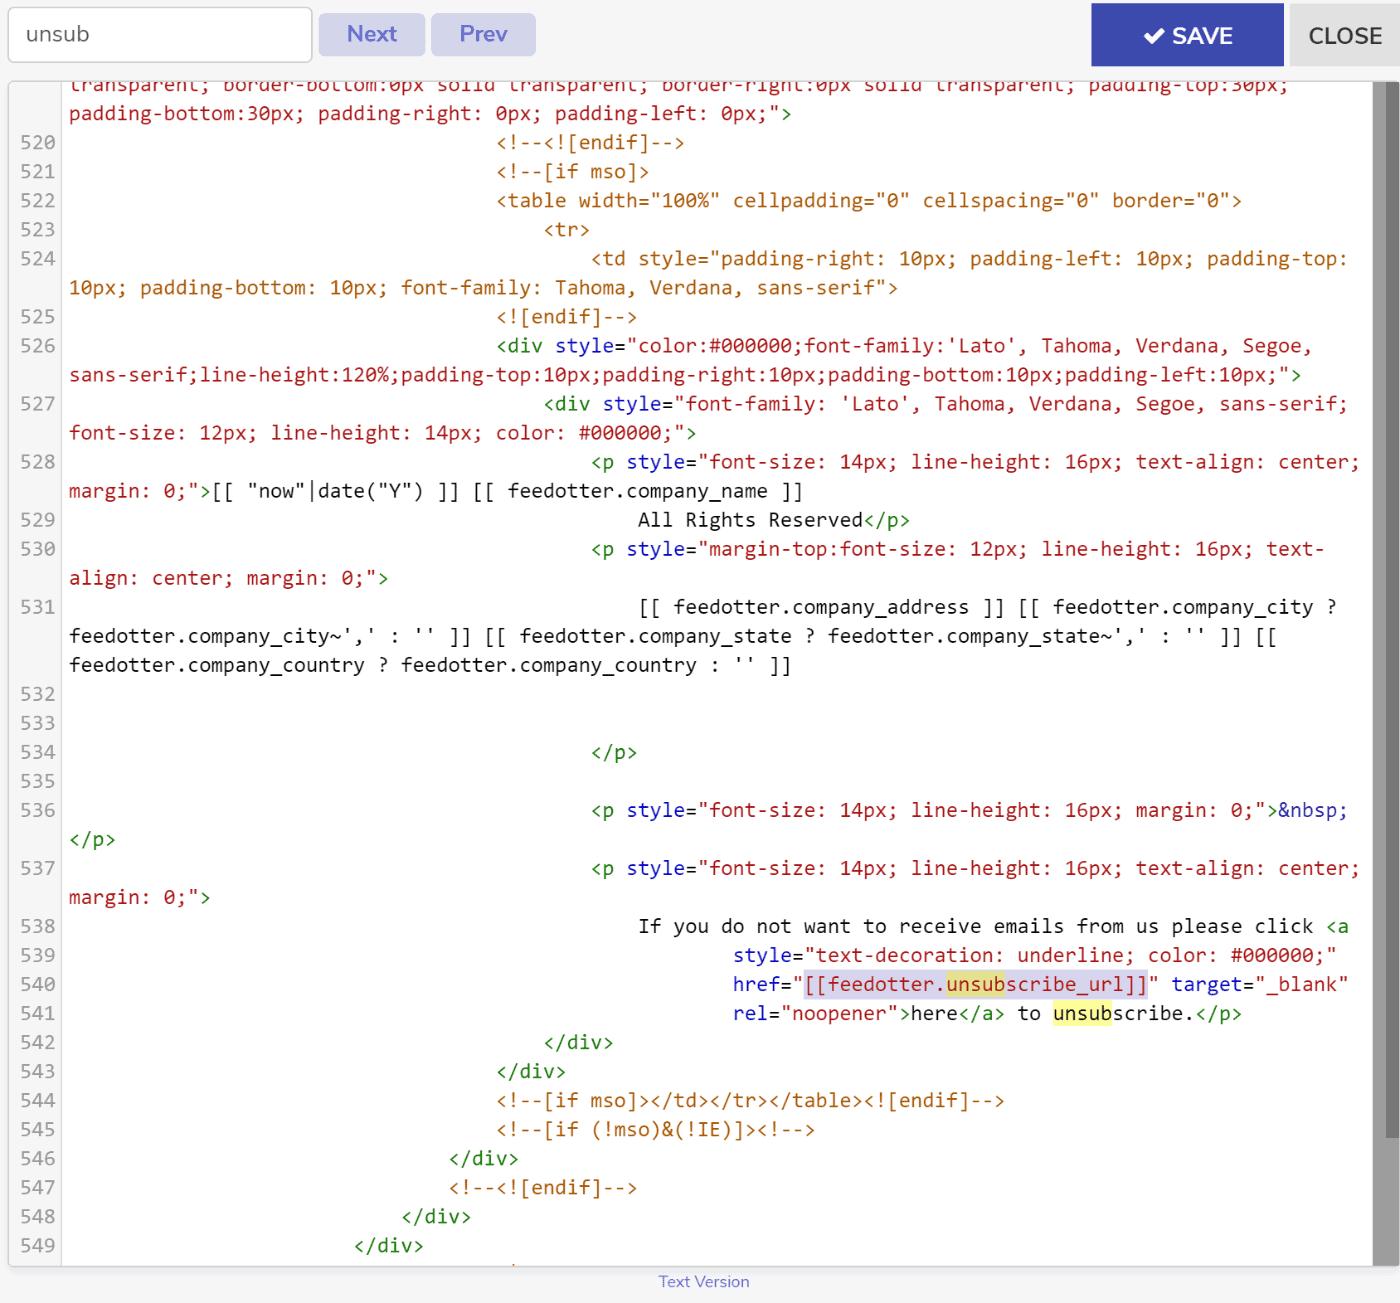 FeedOtter Code Editor